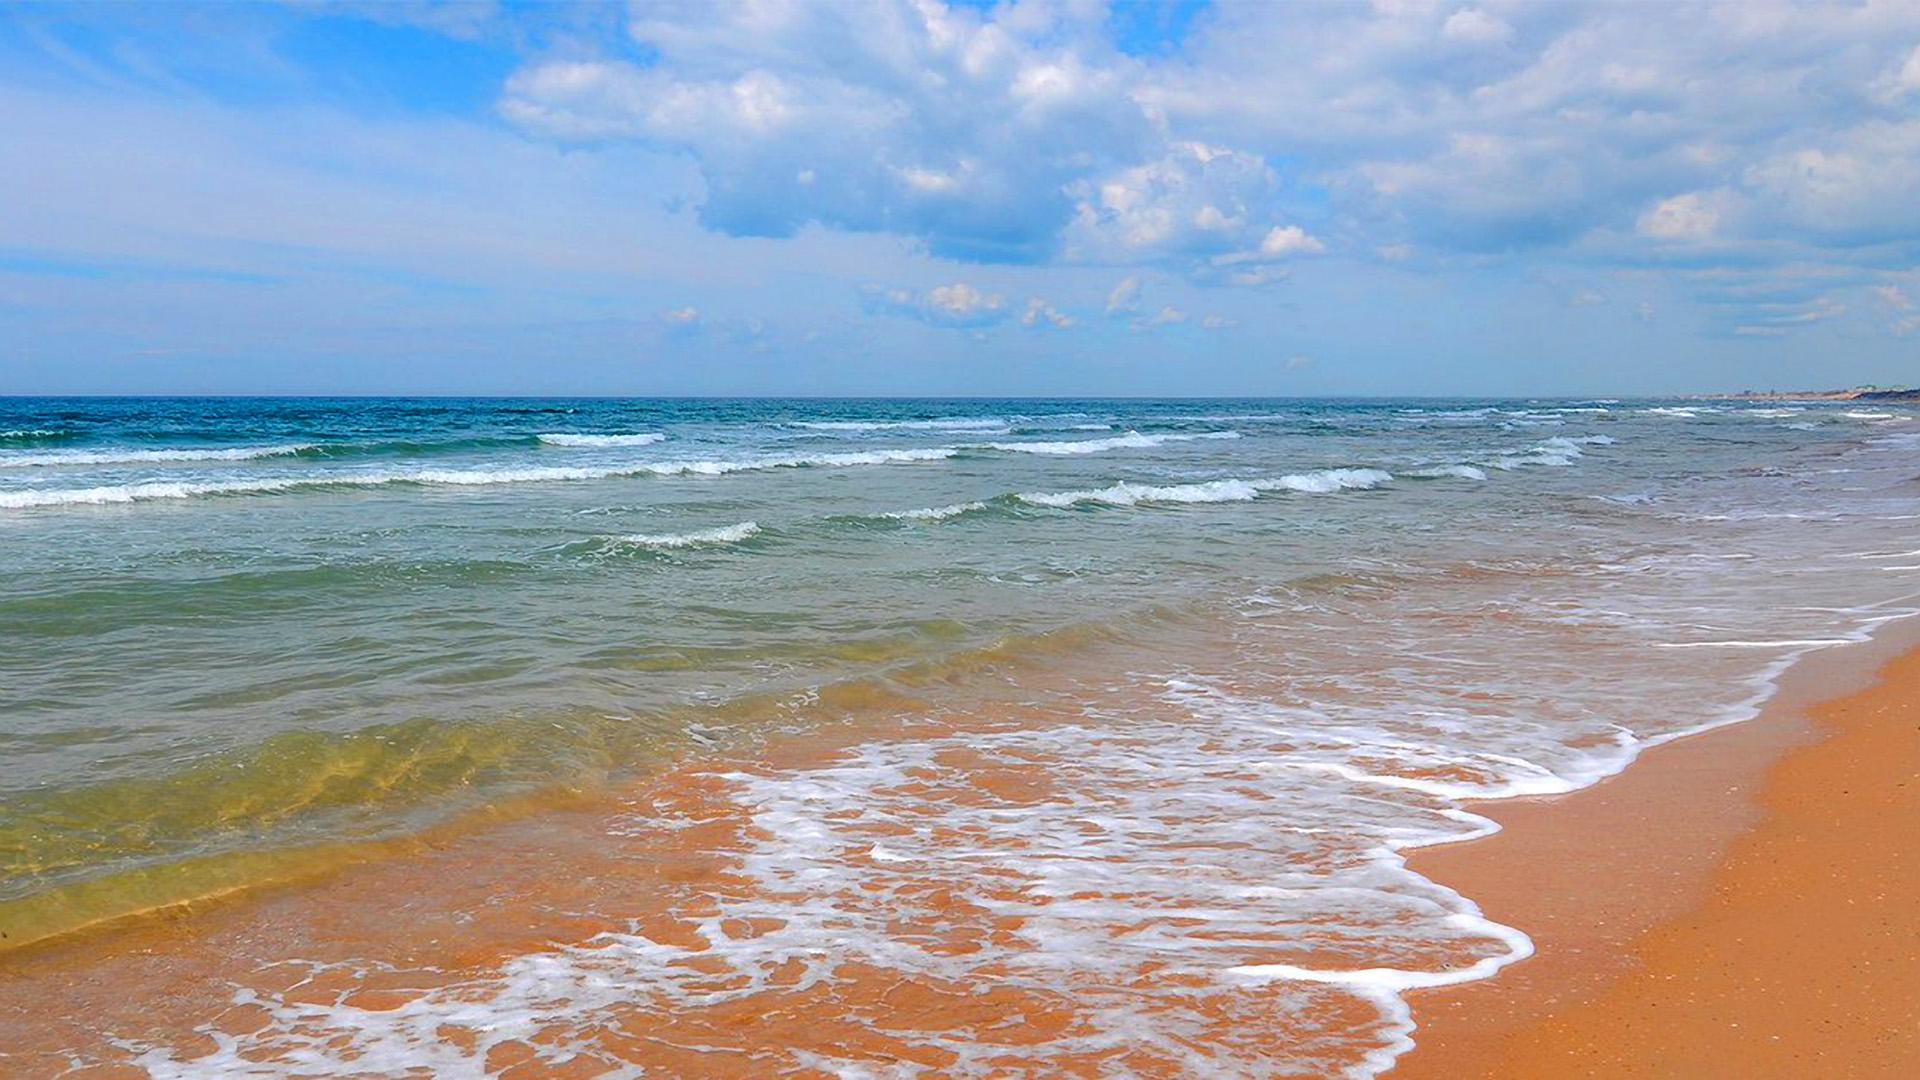 Берег моря в Анапе - обои на рабочий стол